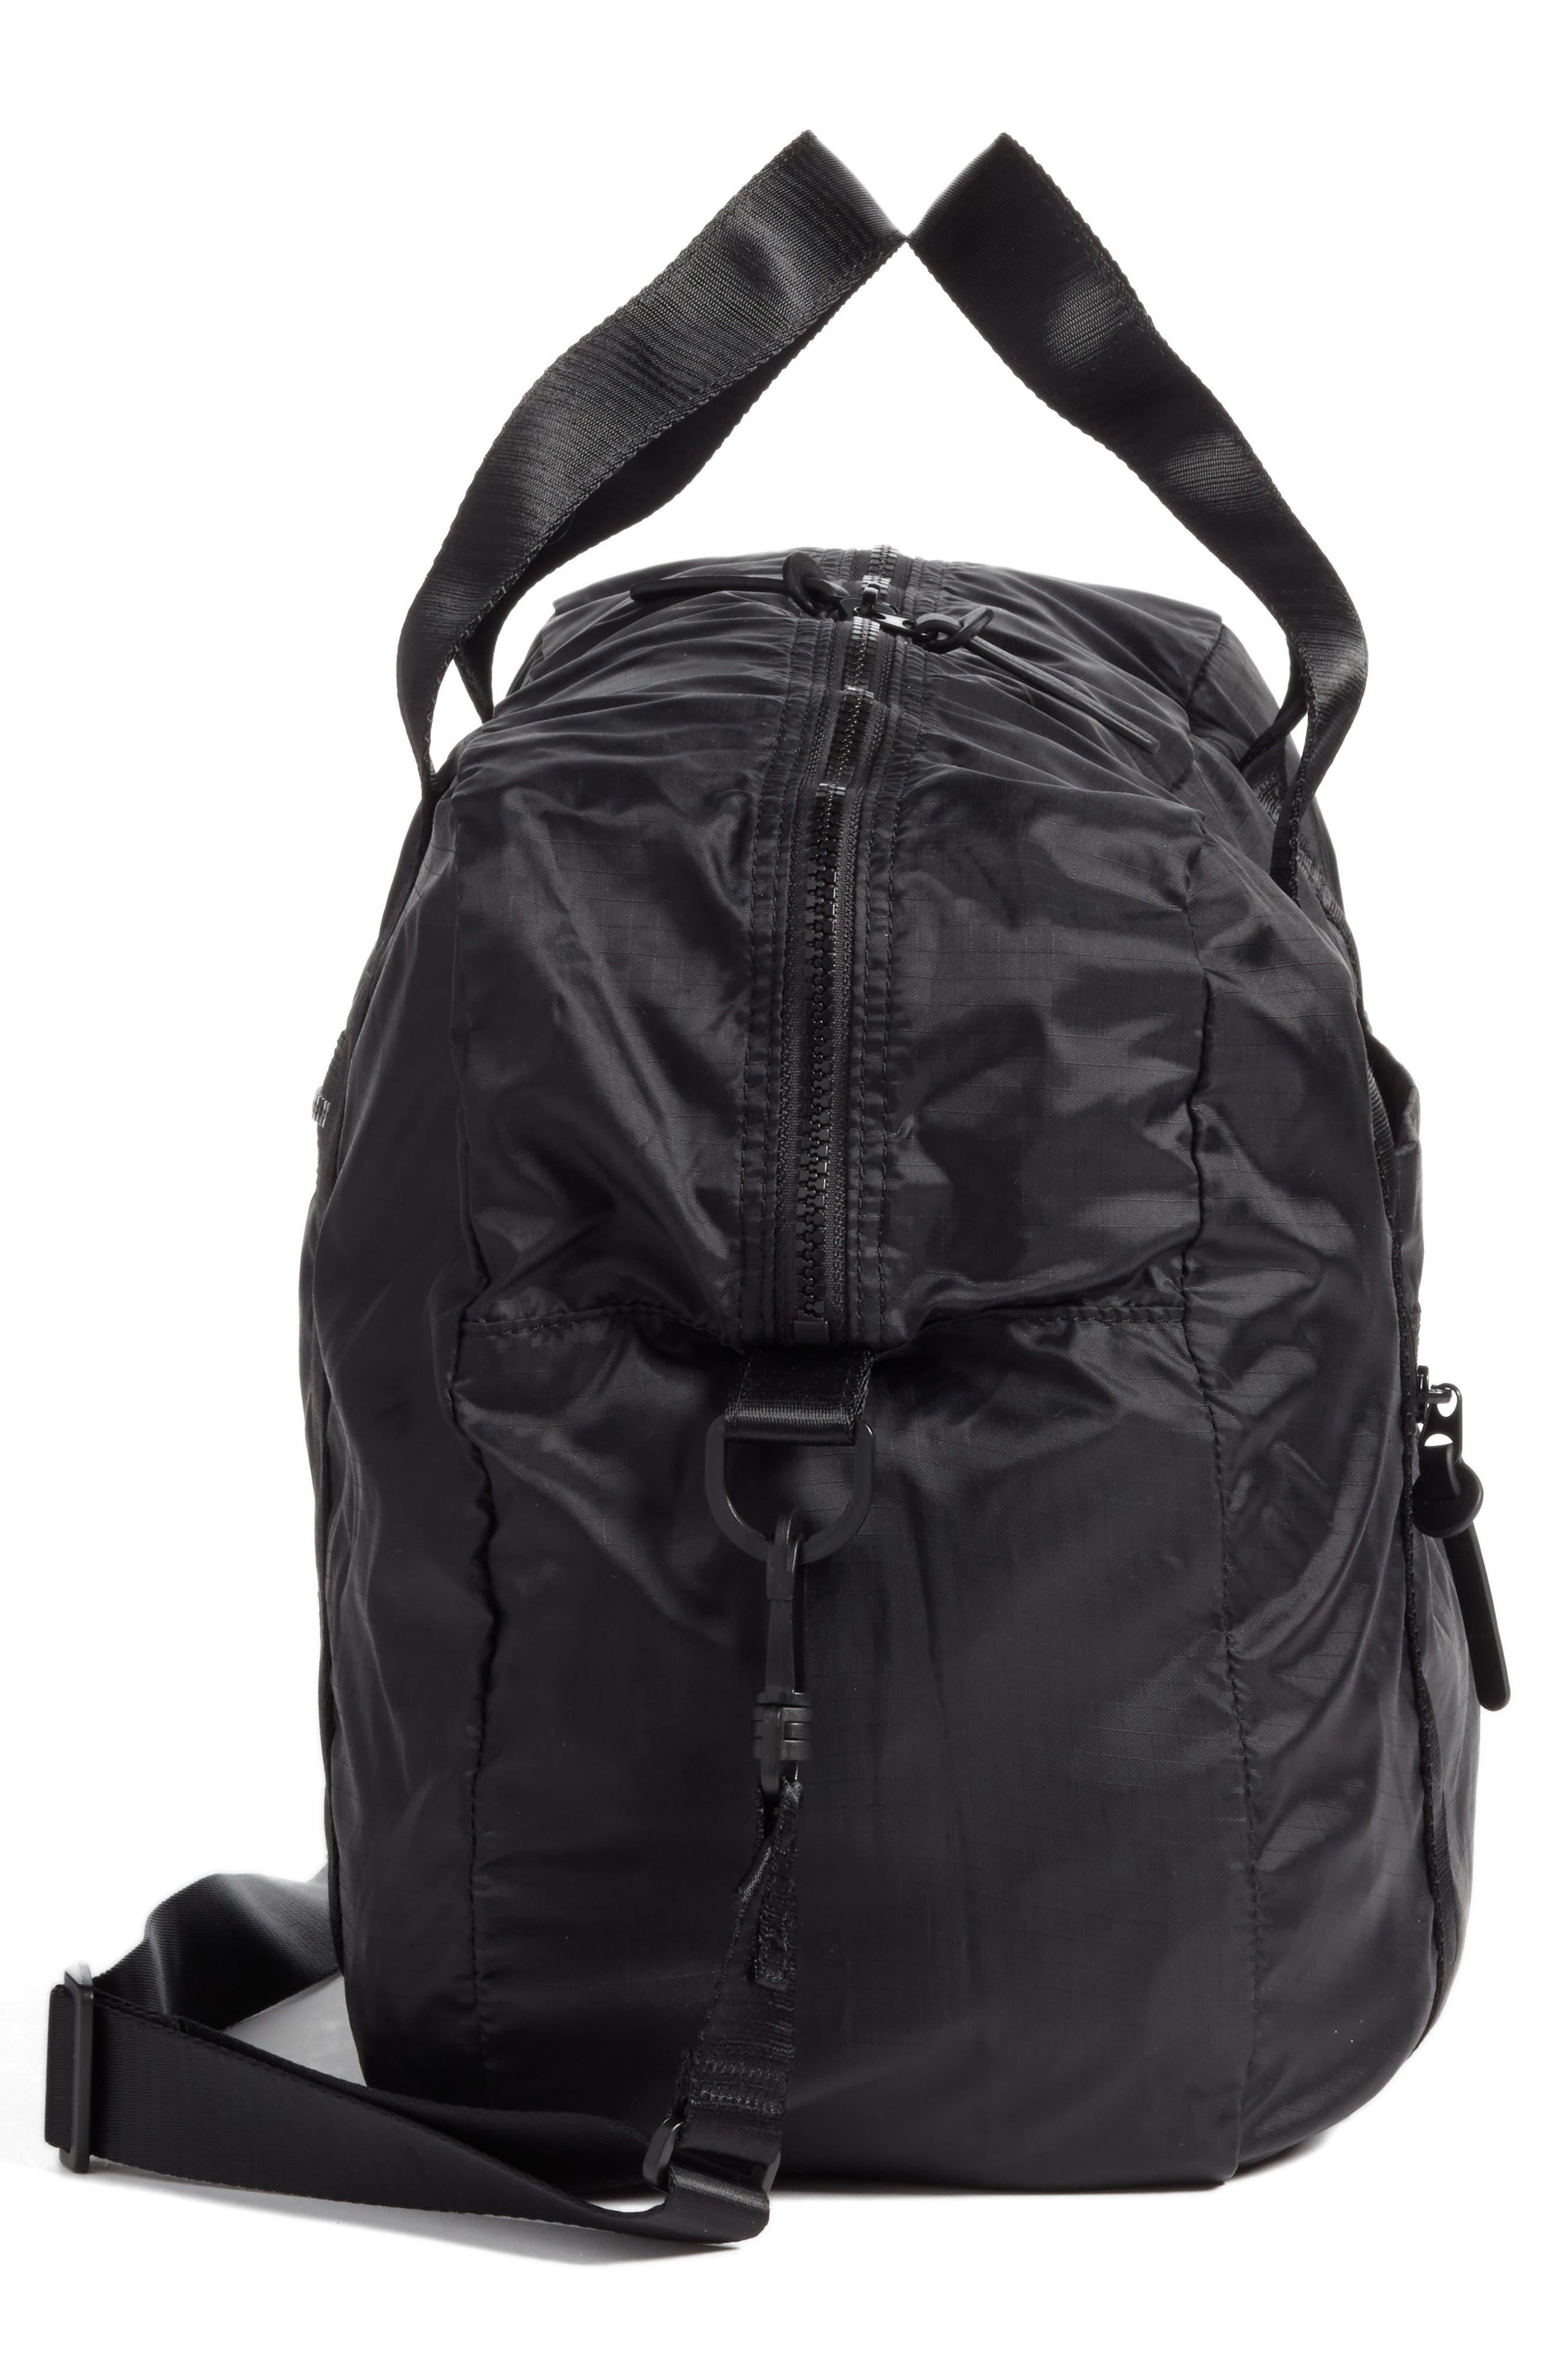 NORDSTROM, Packable Nylon Duffel Bag, Alternate thumbnail 6, color, BLACK